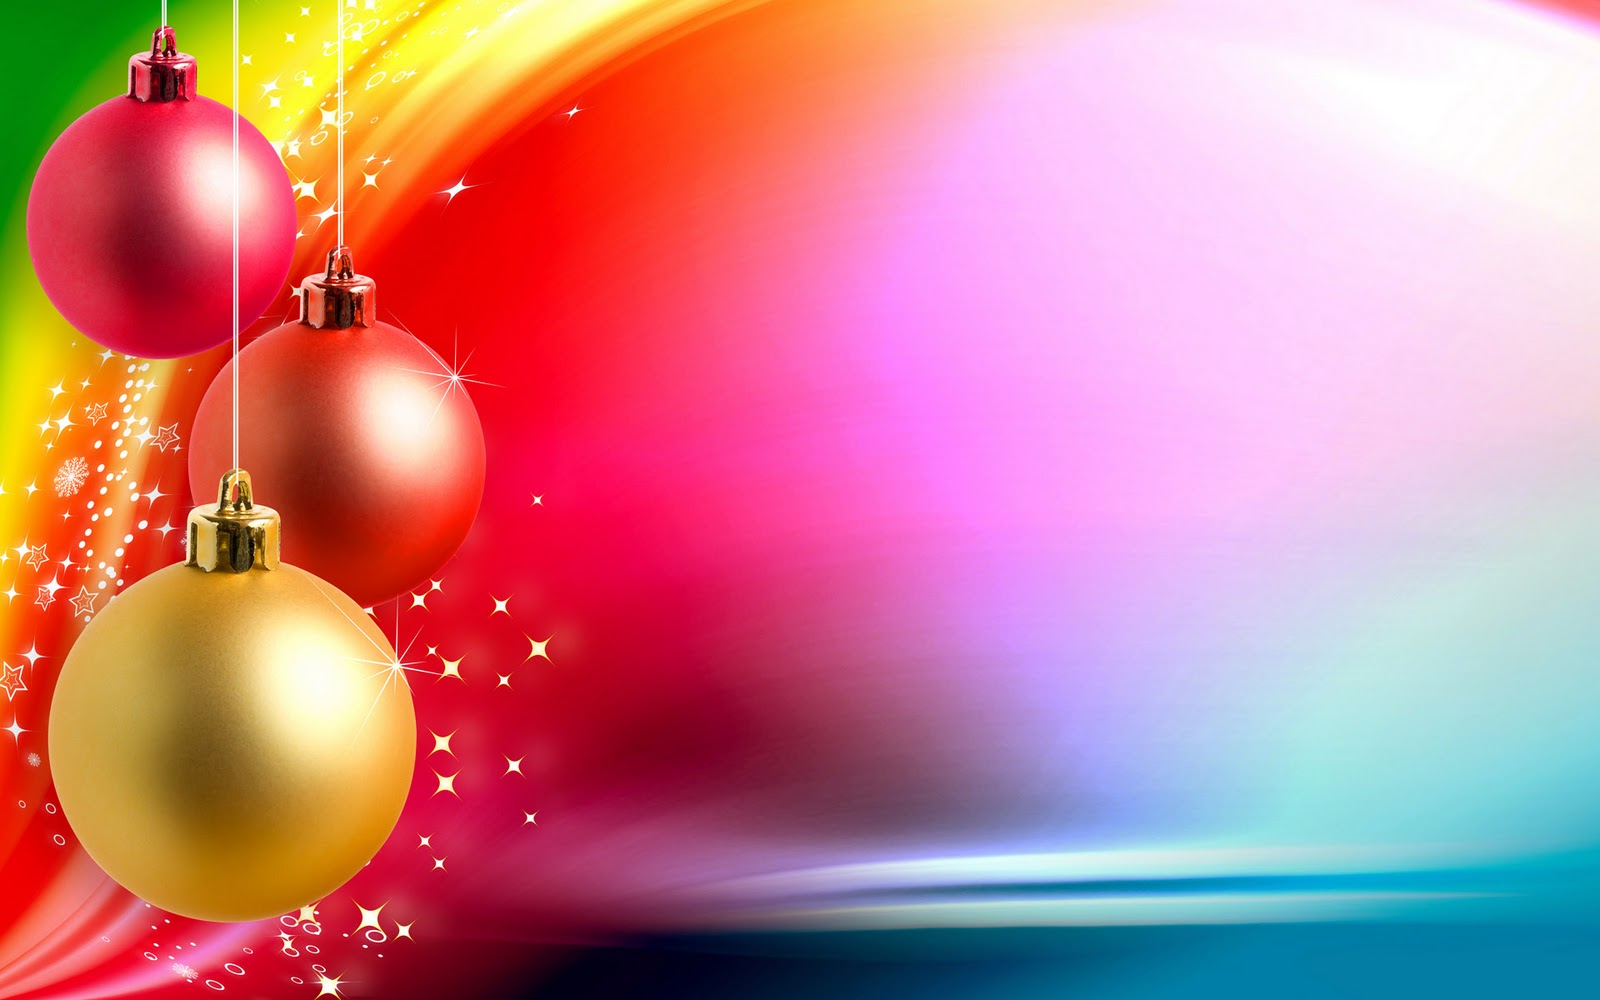 new year greetings 2017